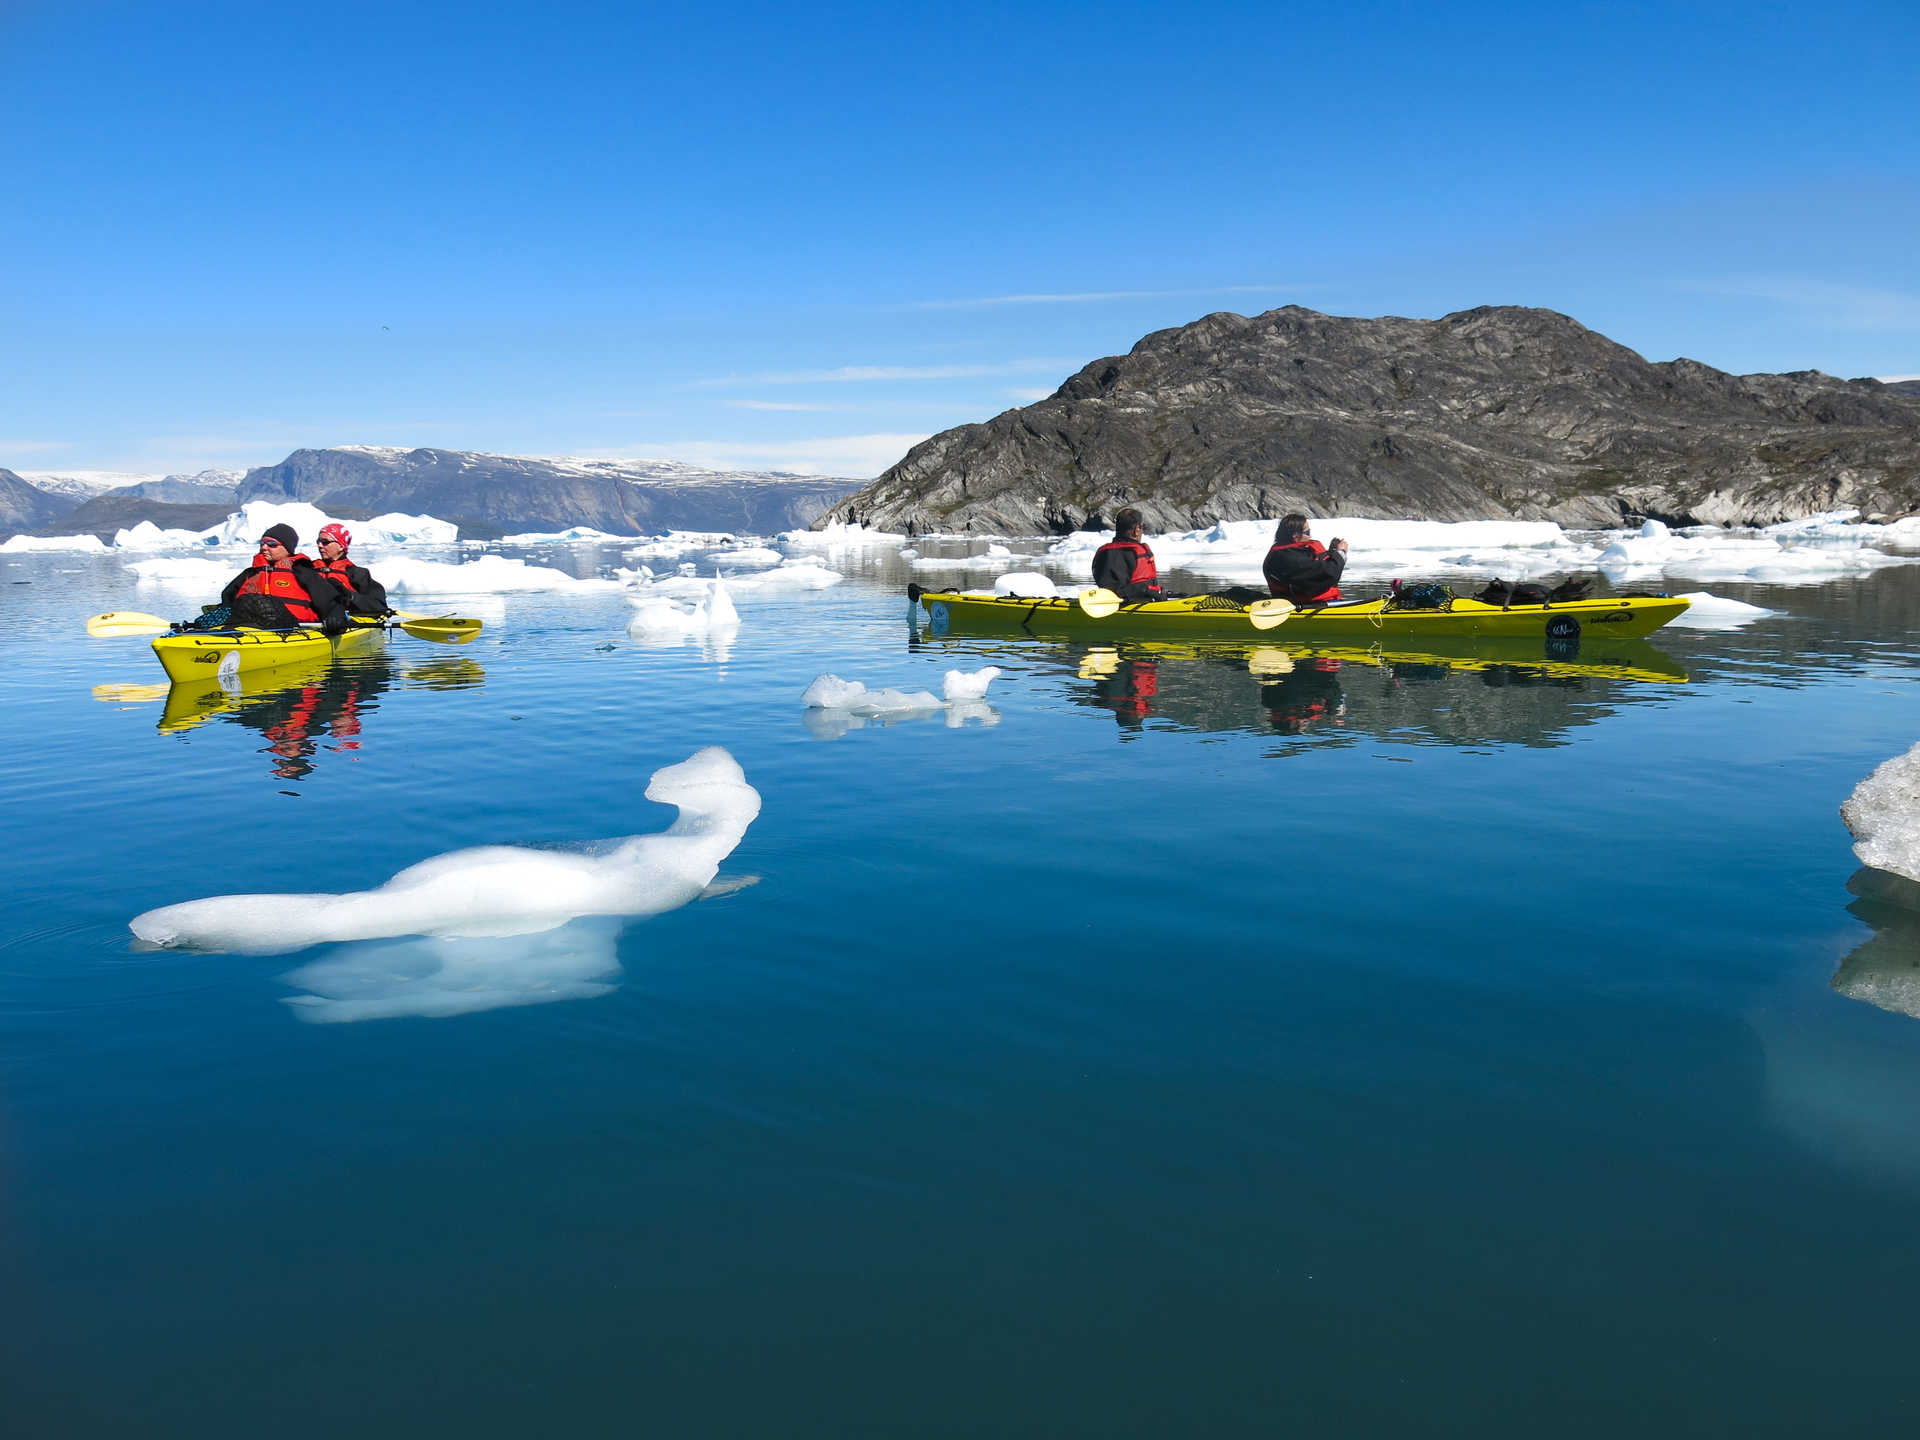 Sea-kayaking among icebergs in Greenland